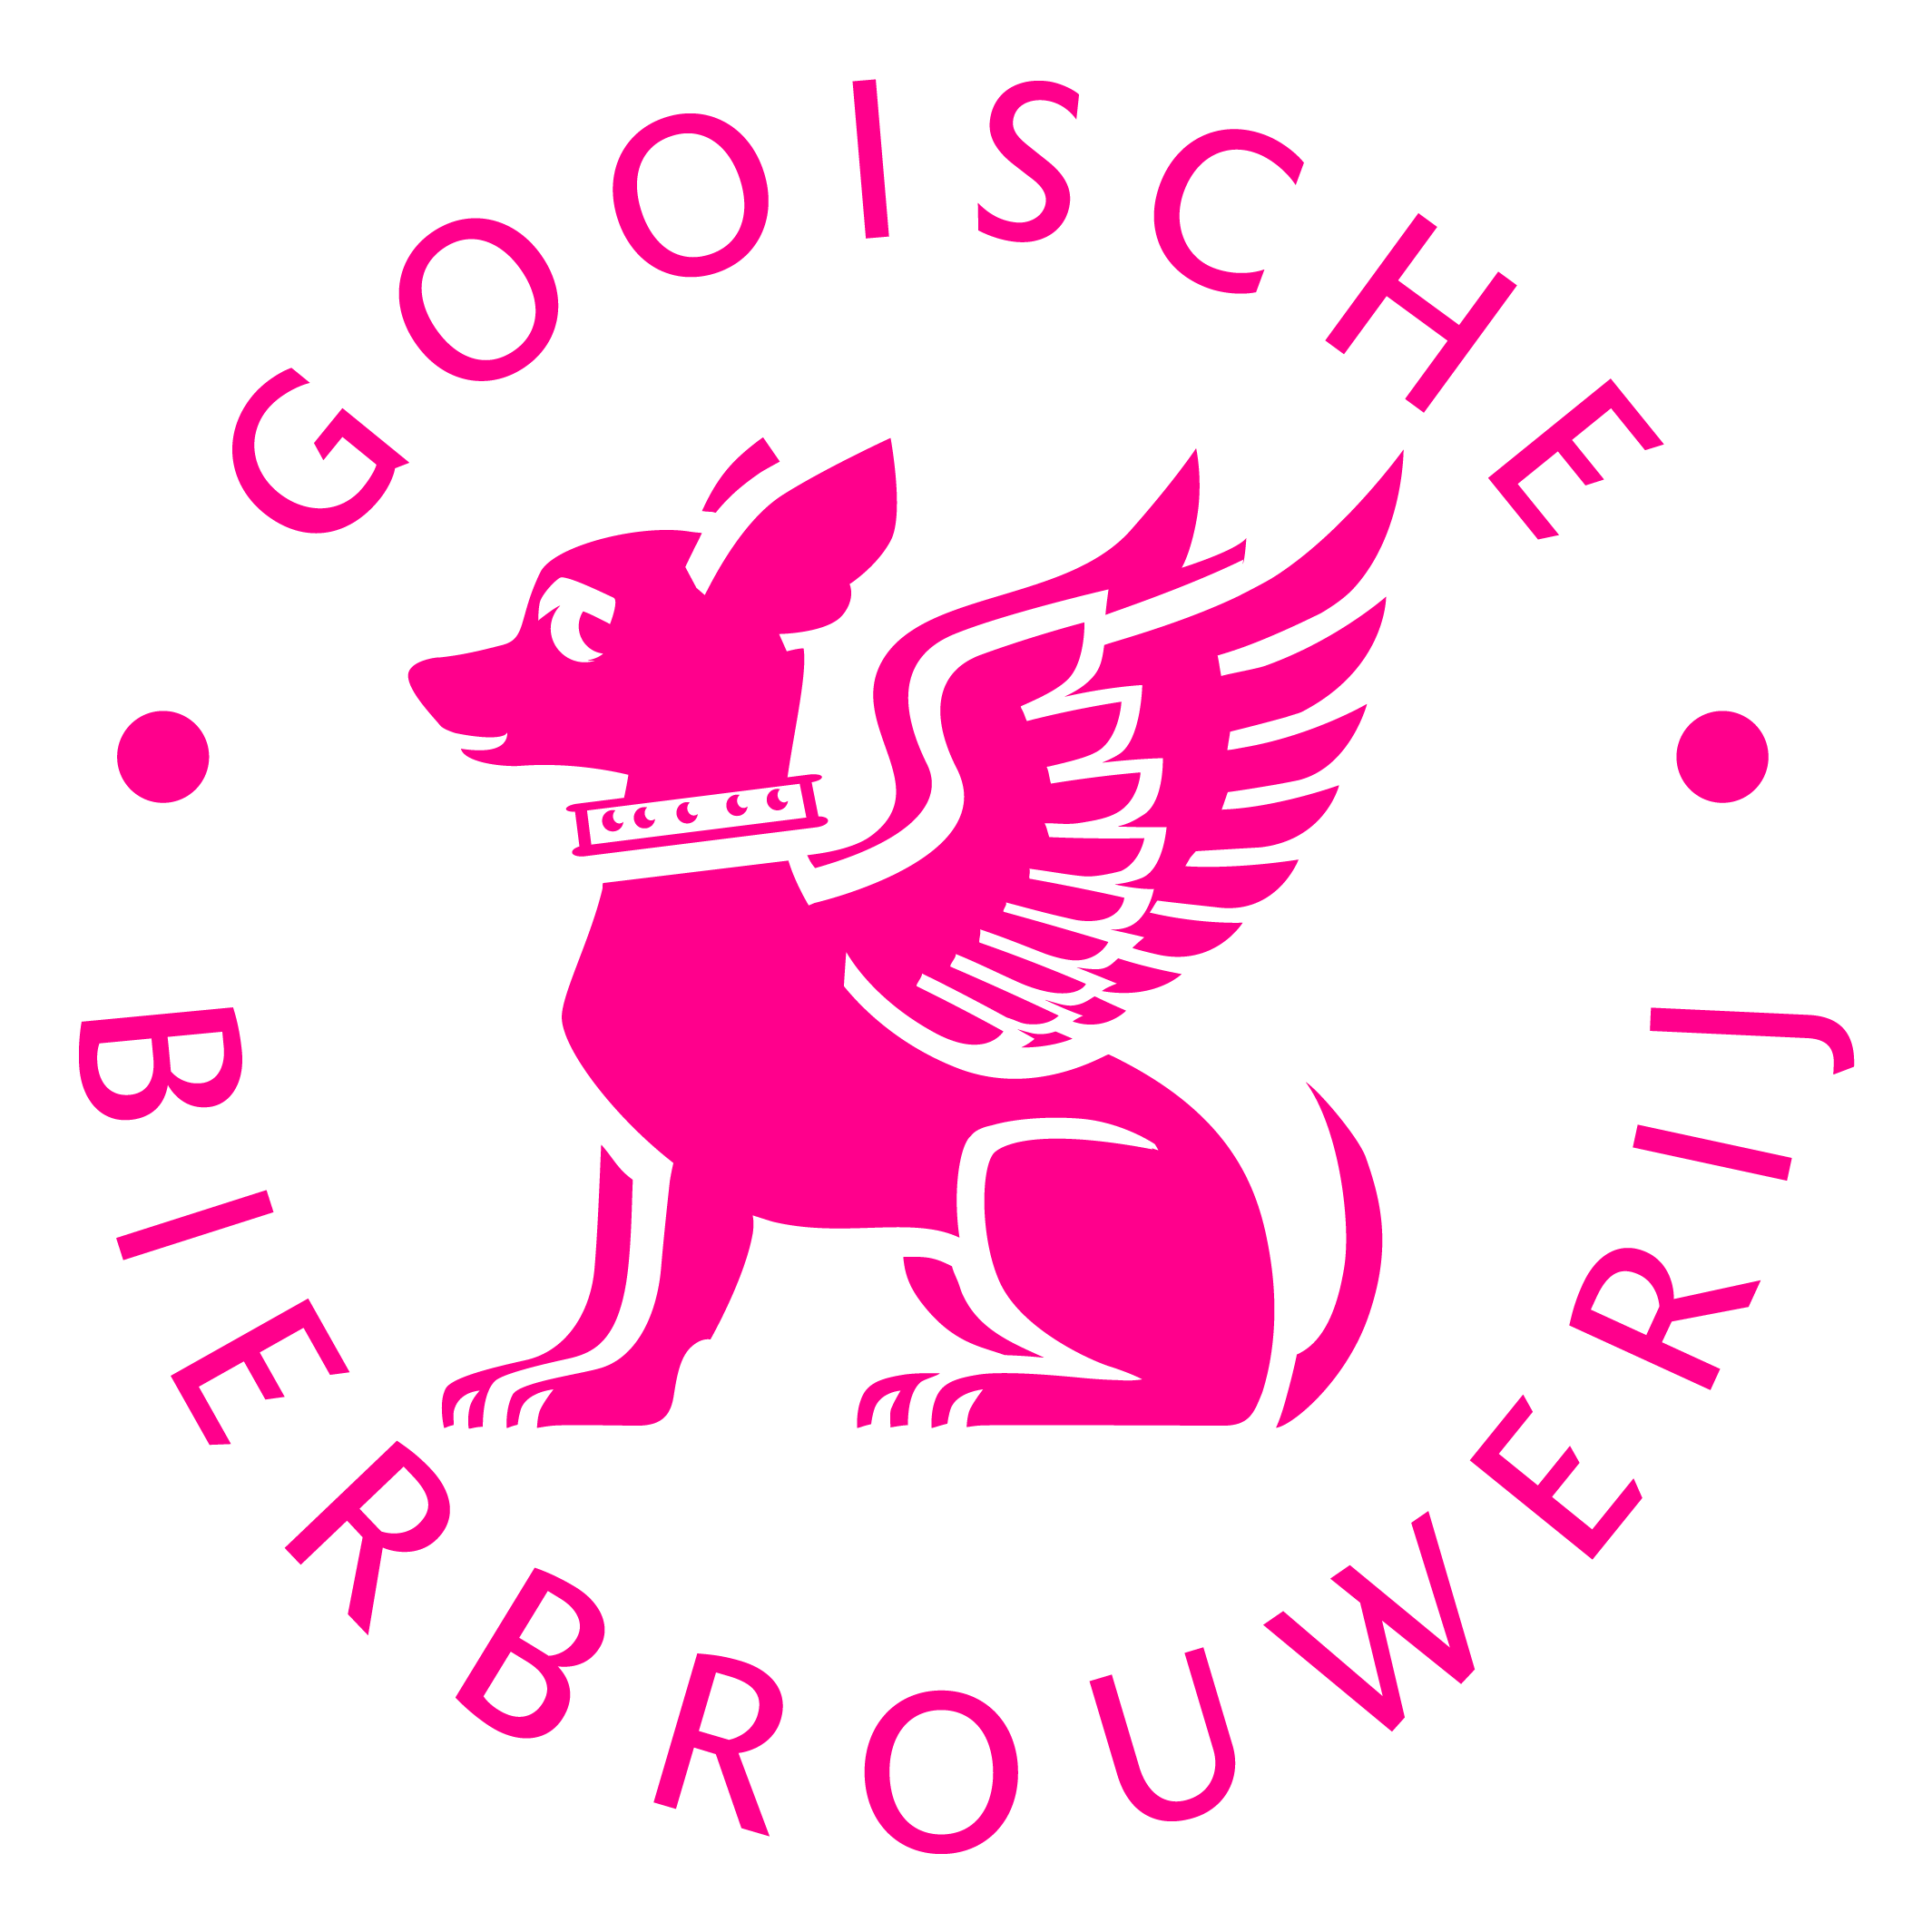 Gooisch Bierfestival